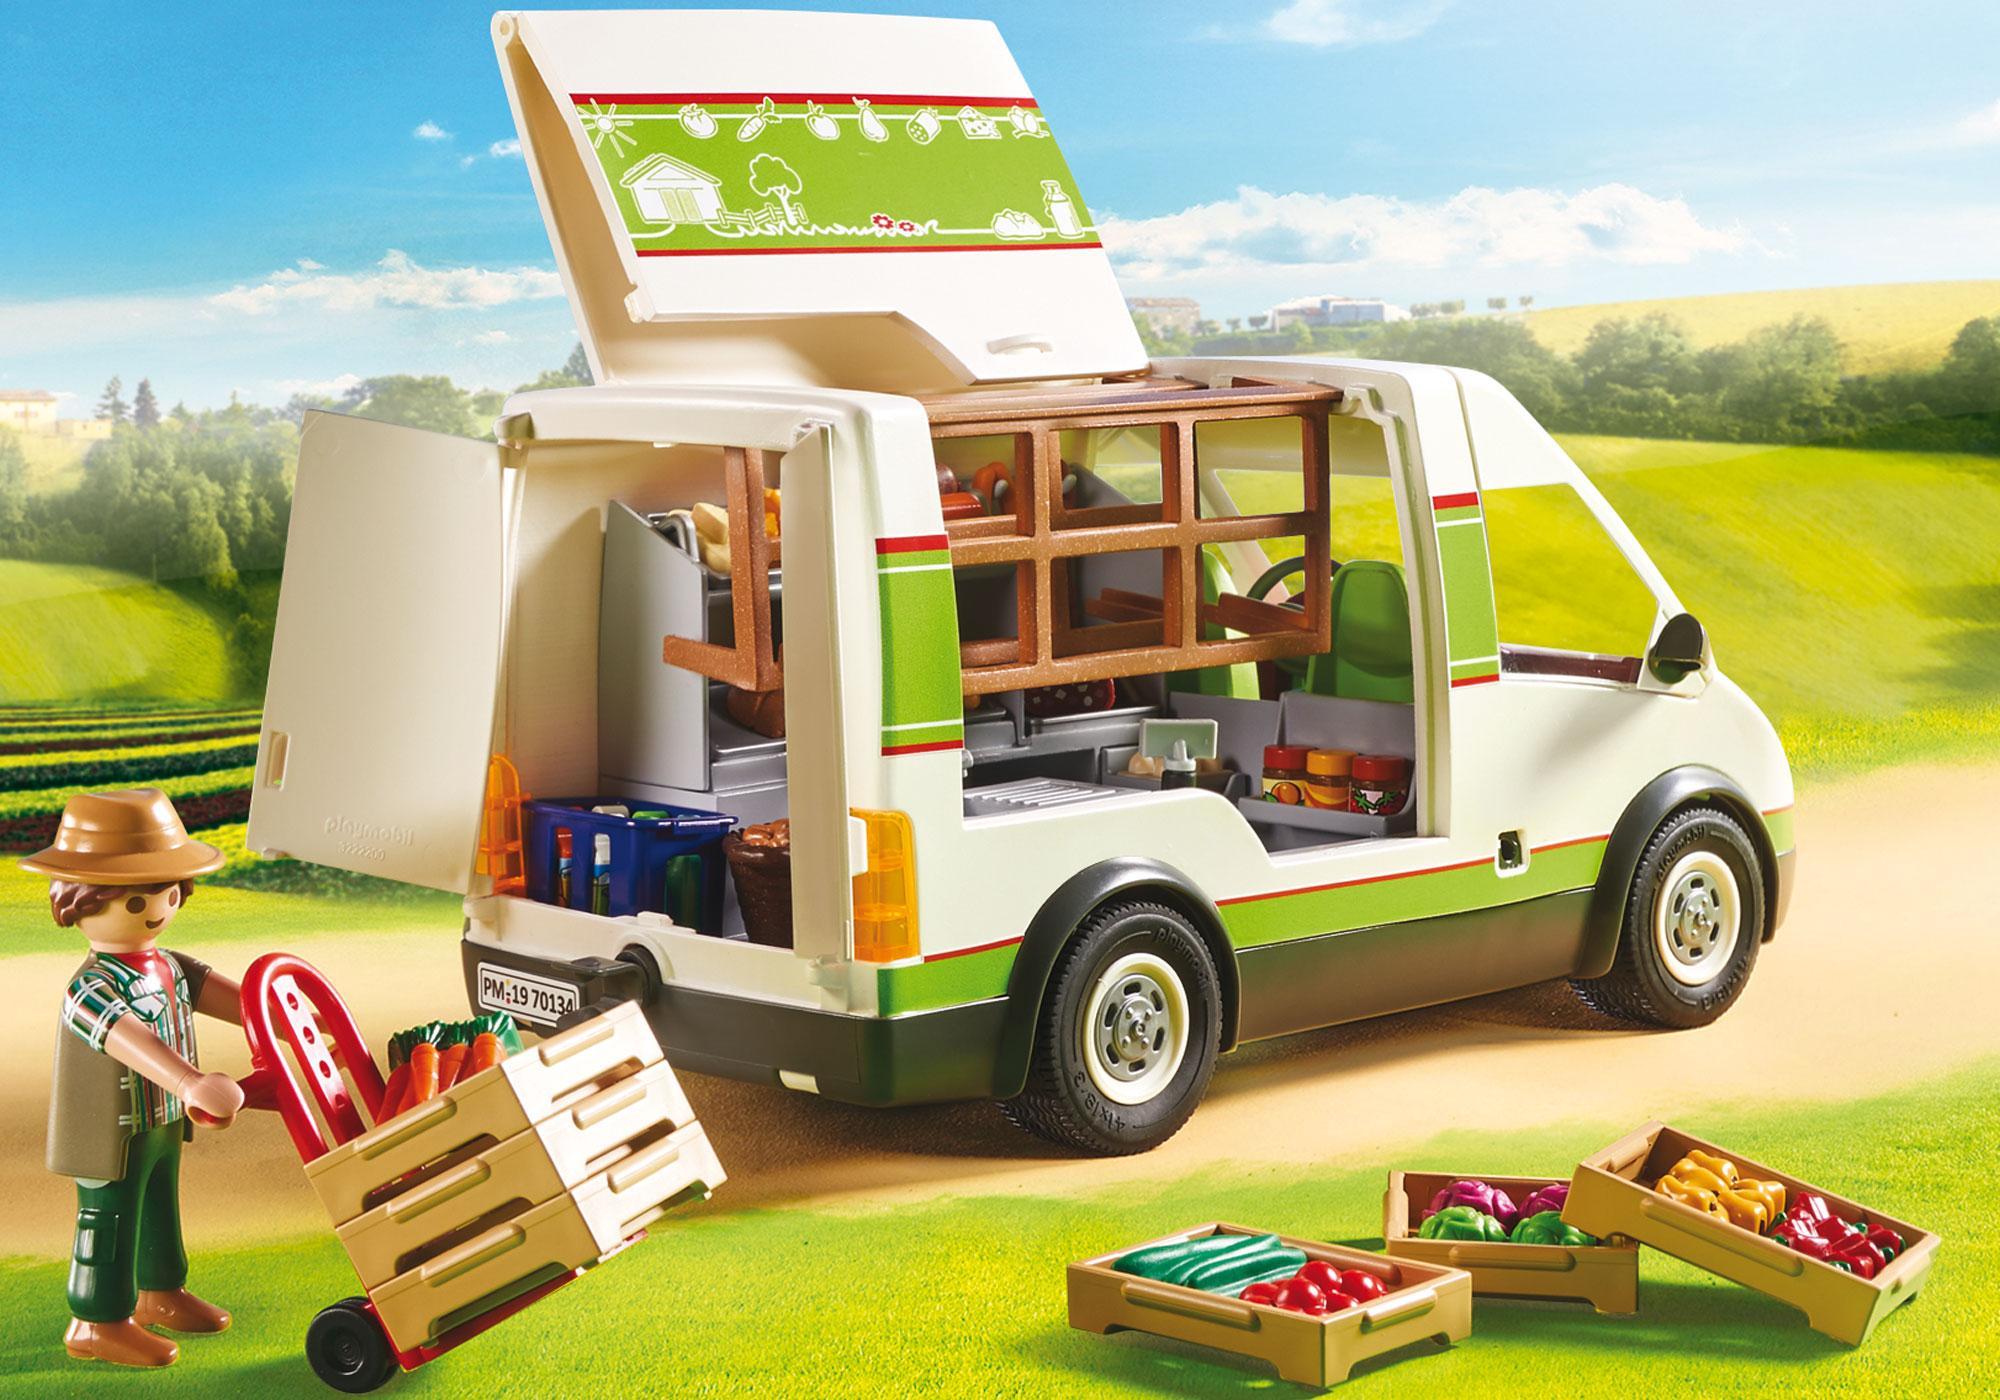 http://media.playmobil.com/i/playmobil/70134_product_extra1/Marktkraamwagen